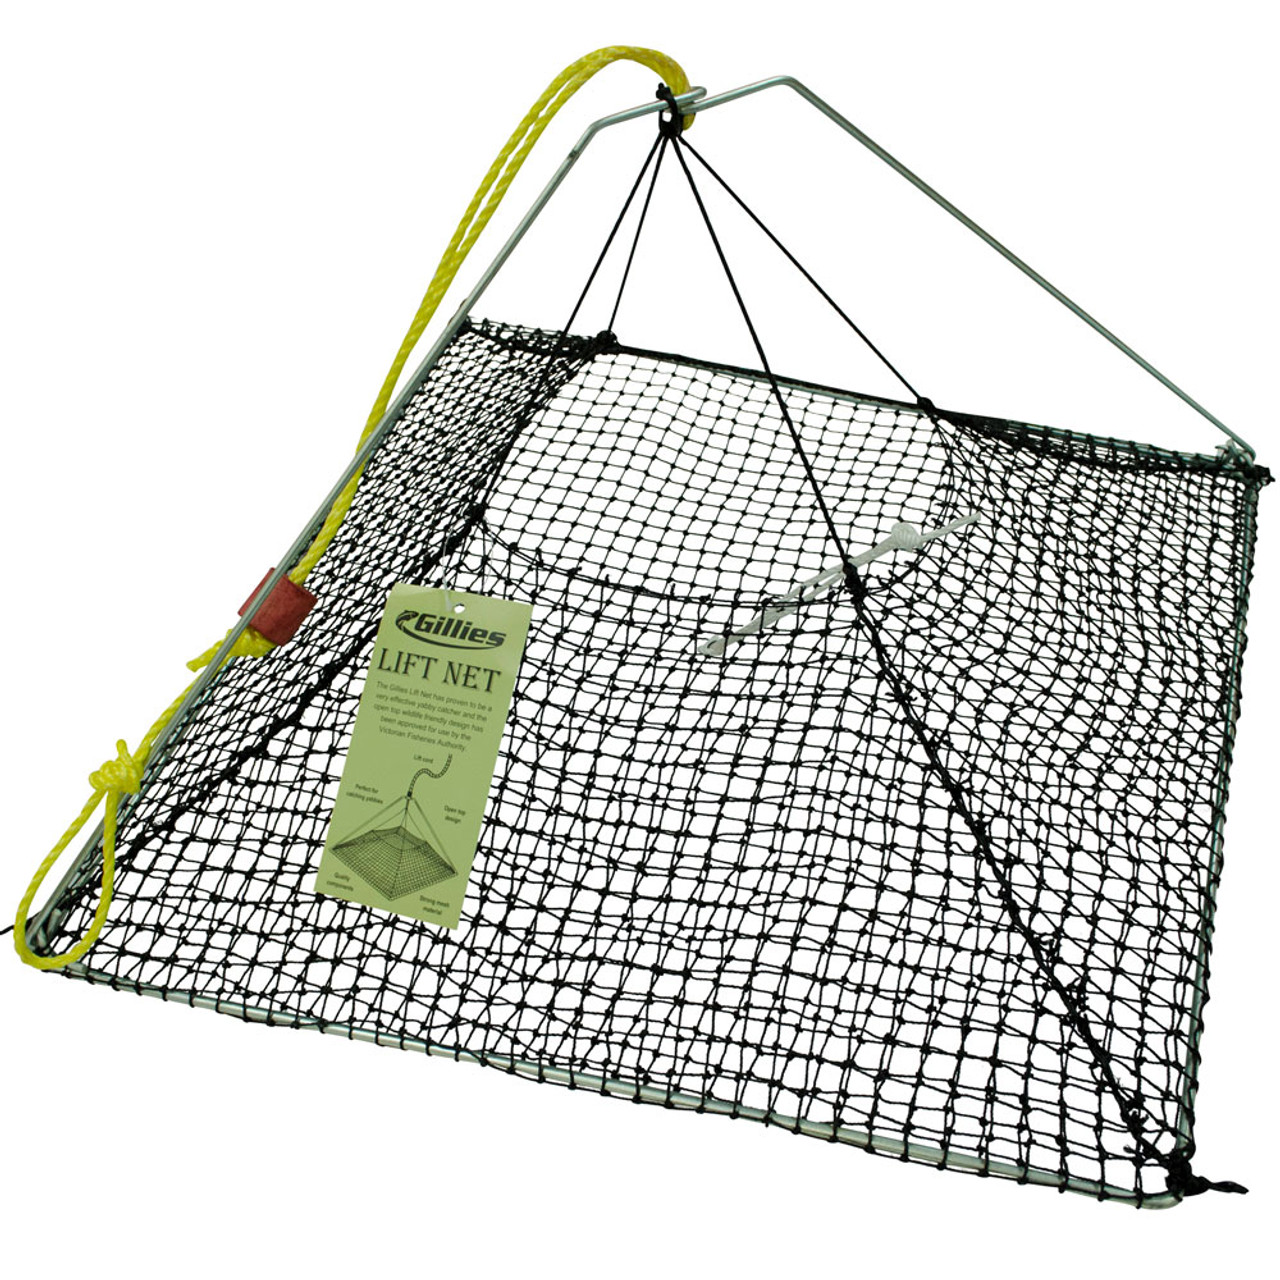 Gillies Pyramid Yabby Nets